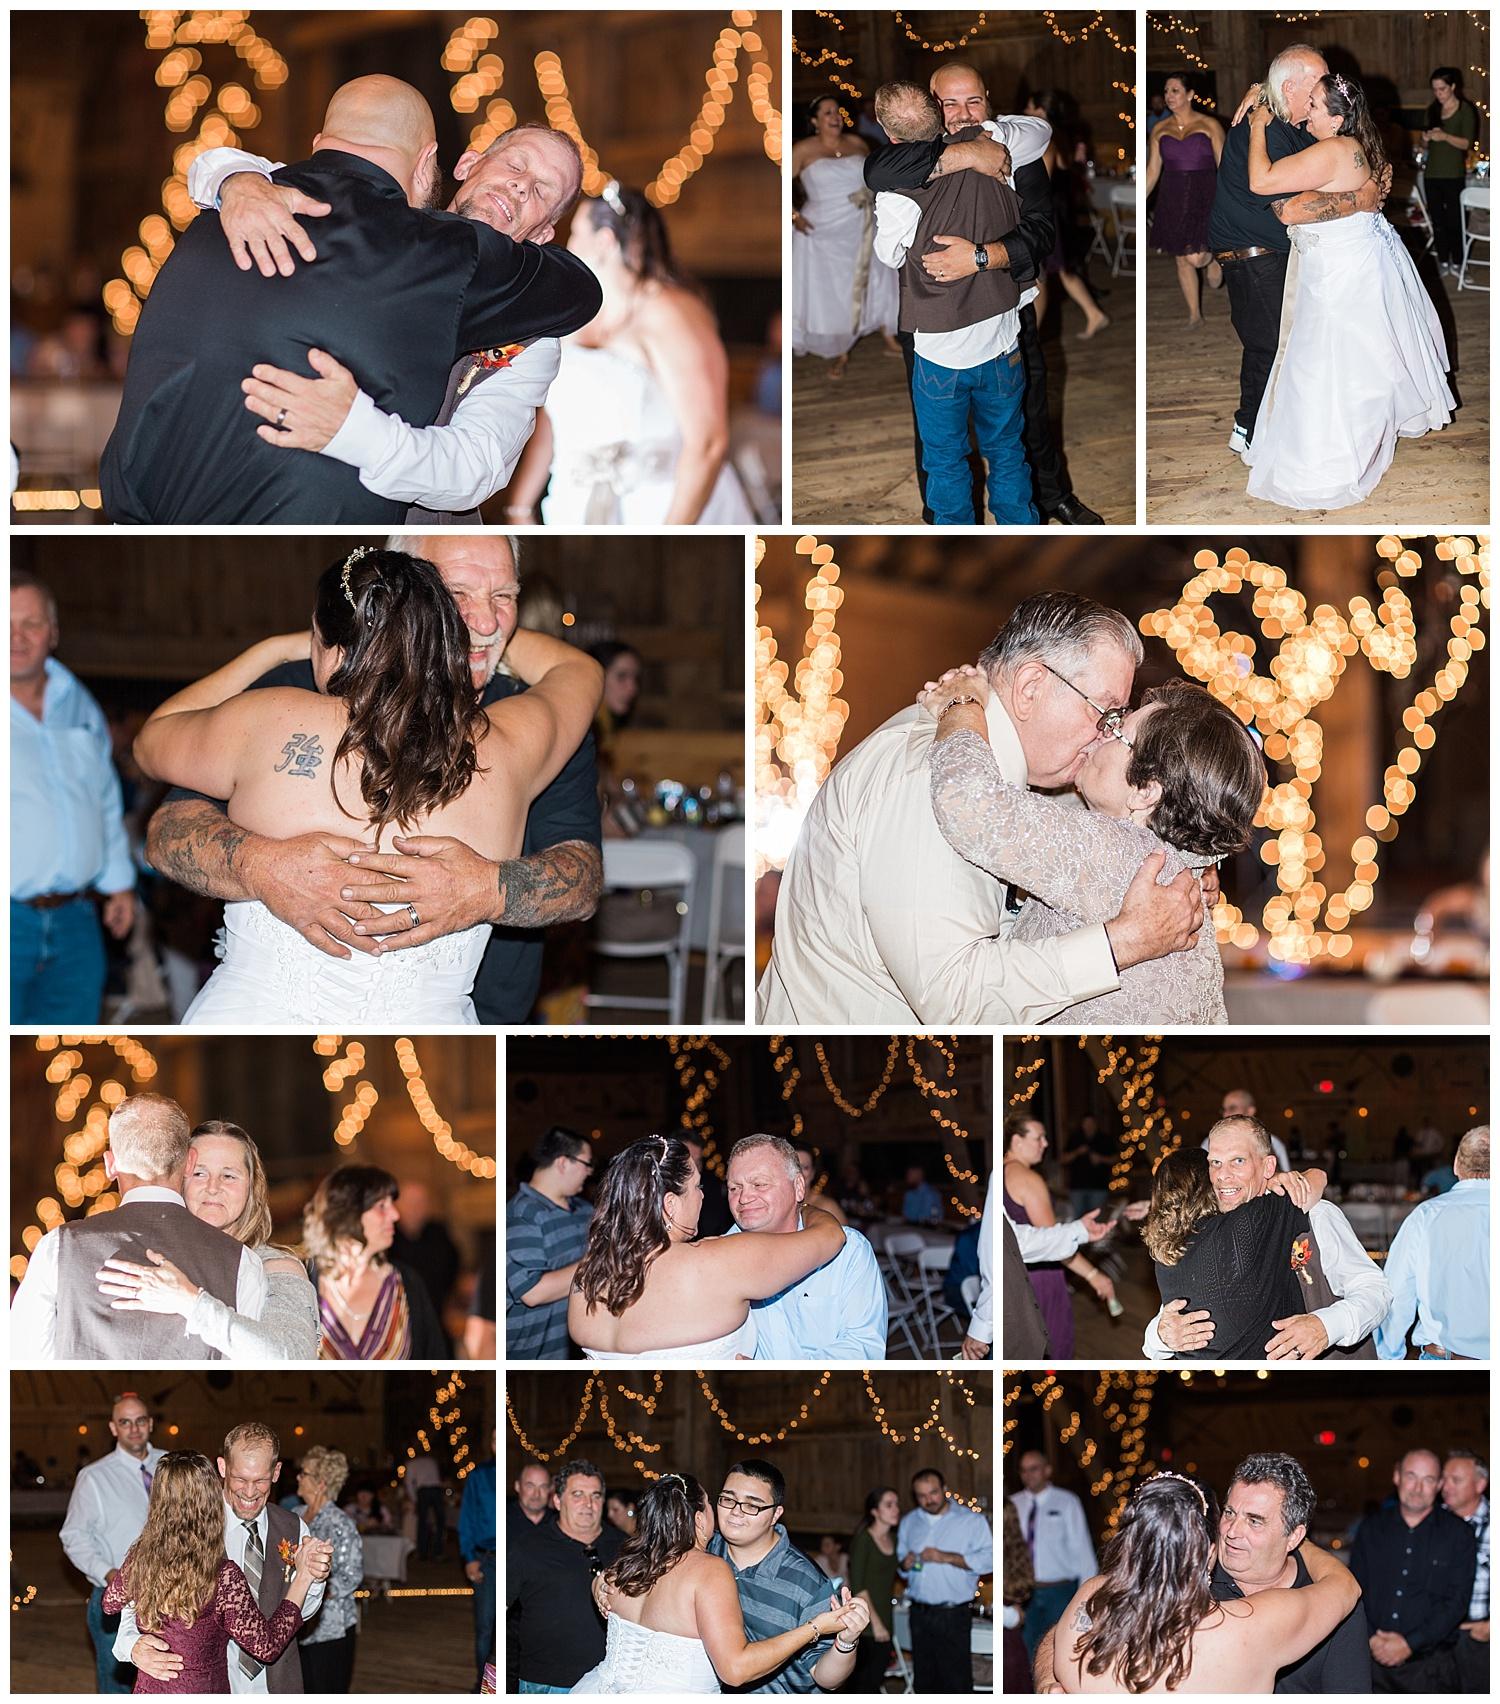 The Hall Wedding - York NY - Lass and Beau-1372_Buffalo wedding photography.jpg